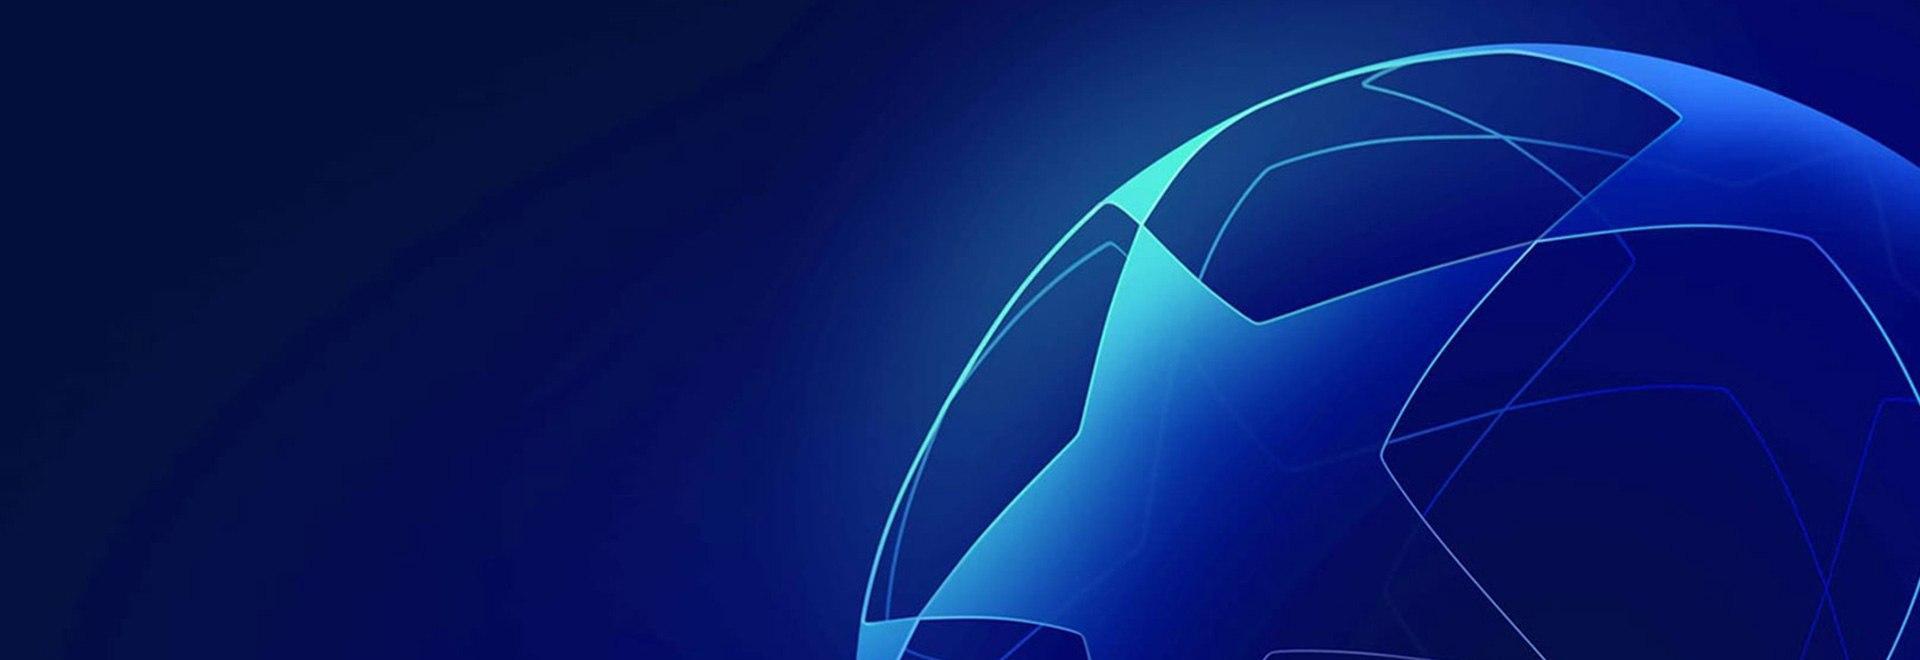 UEFA Champions League Remix